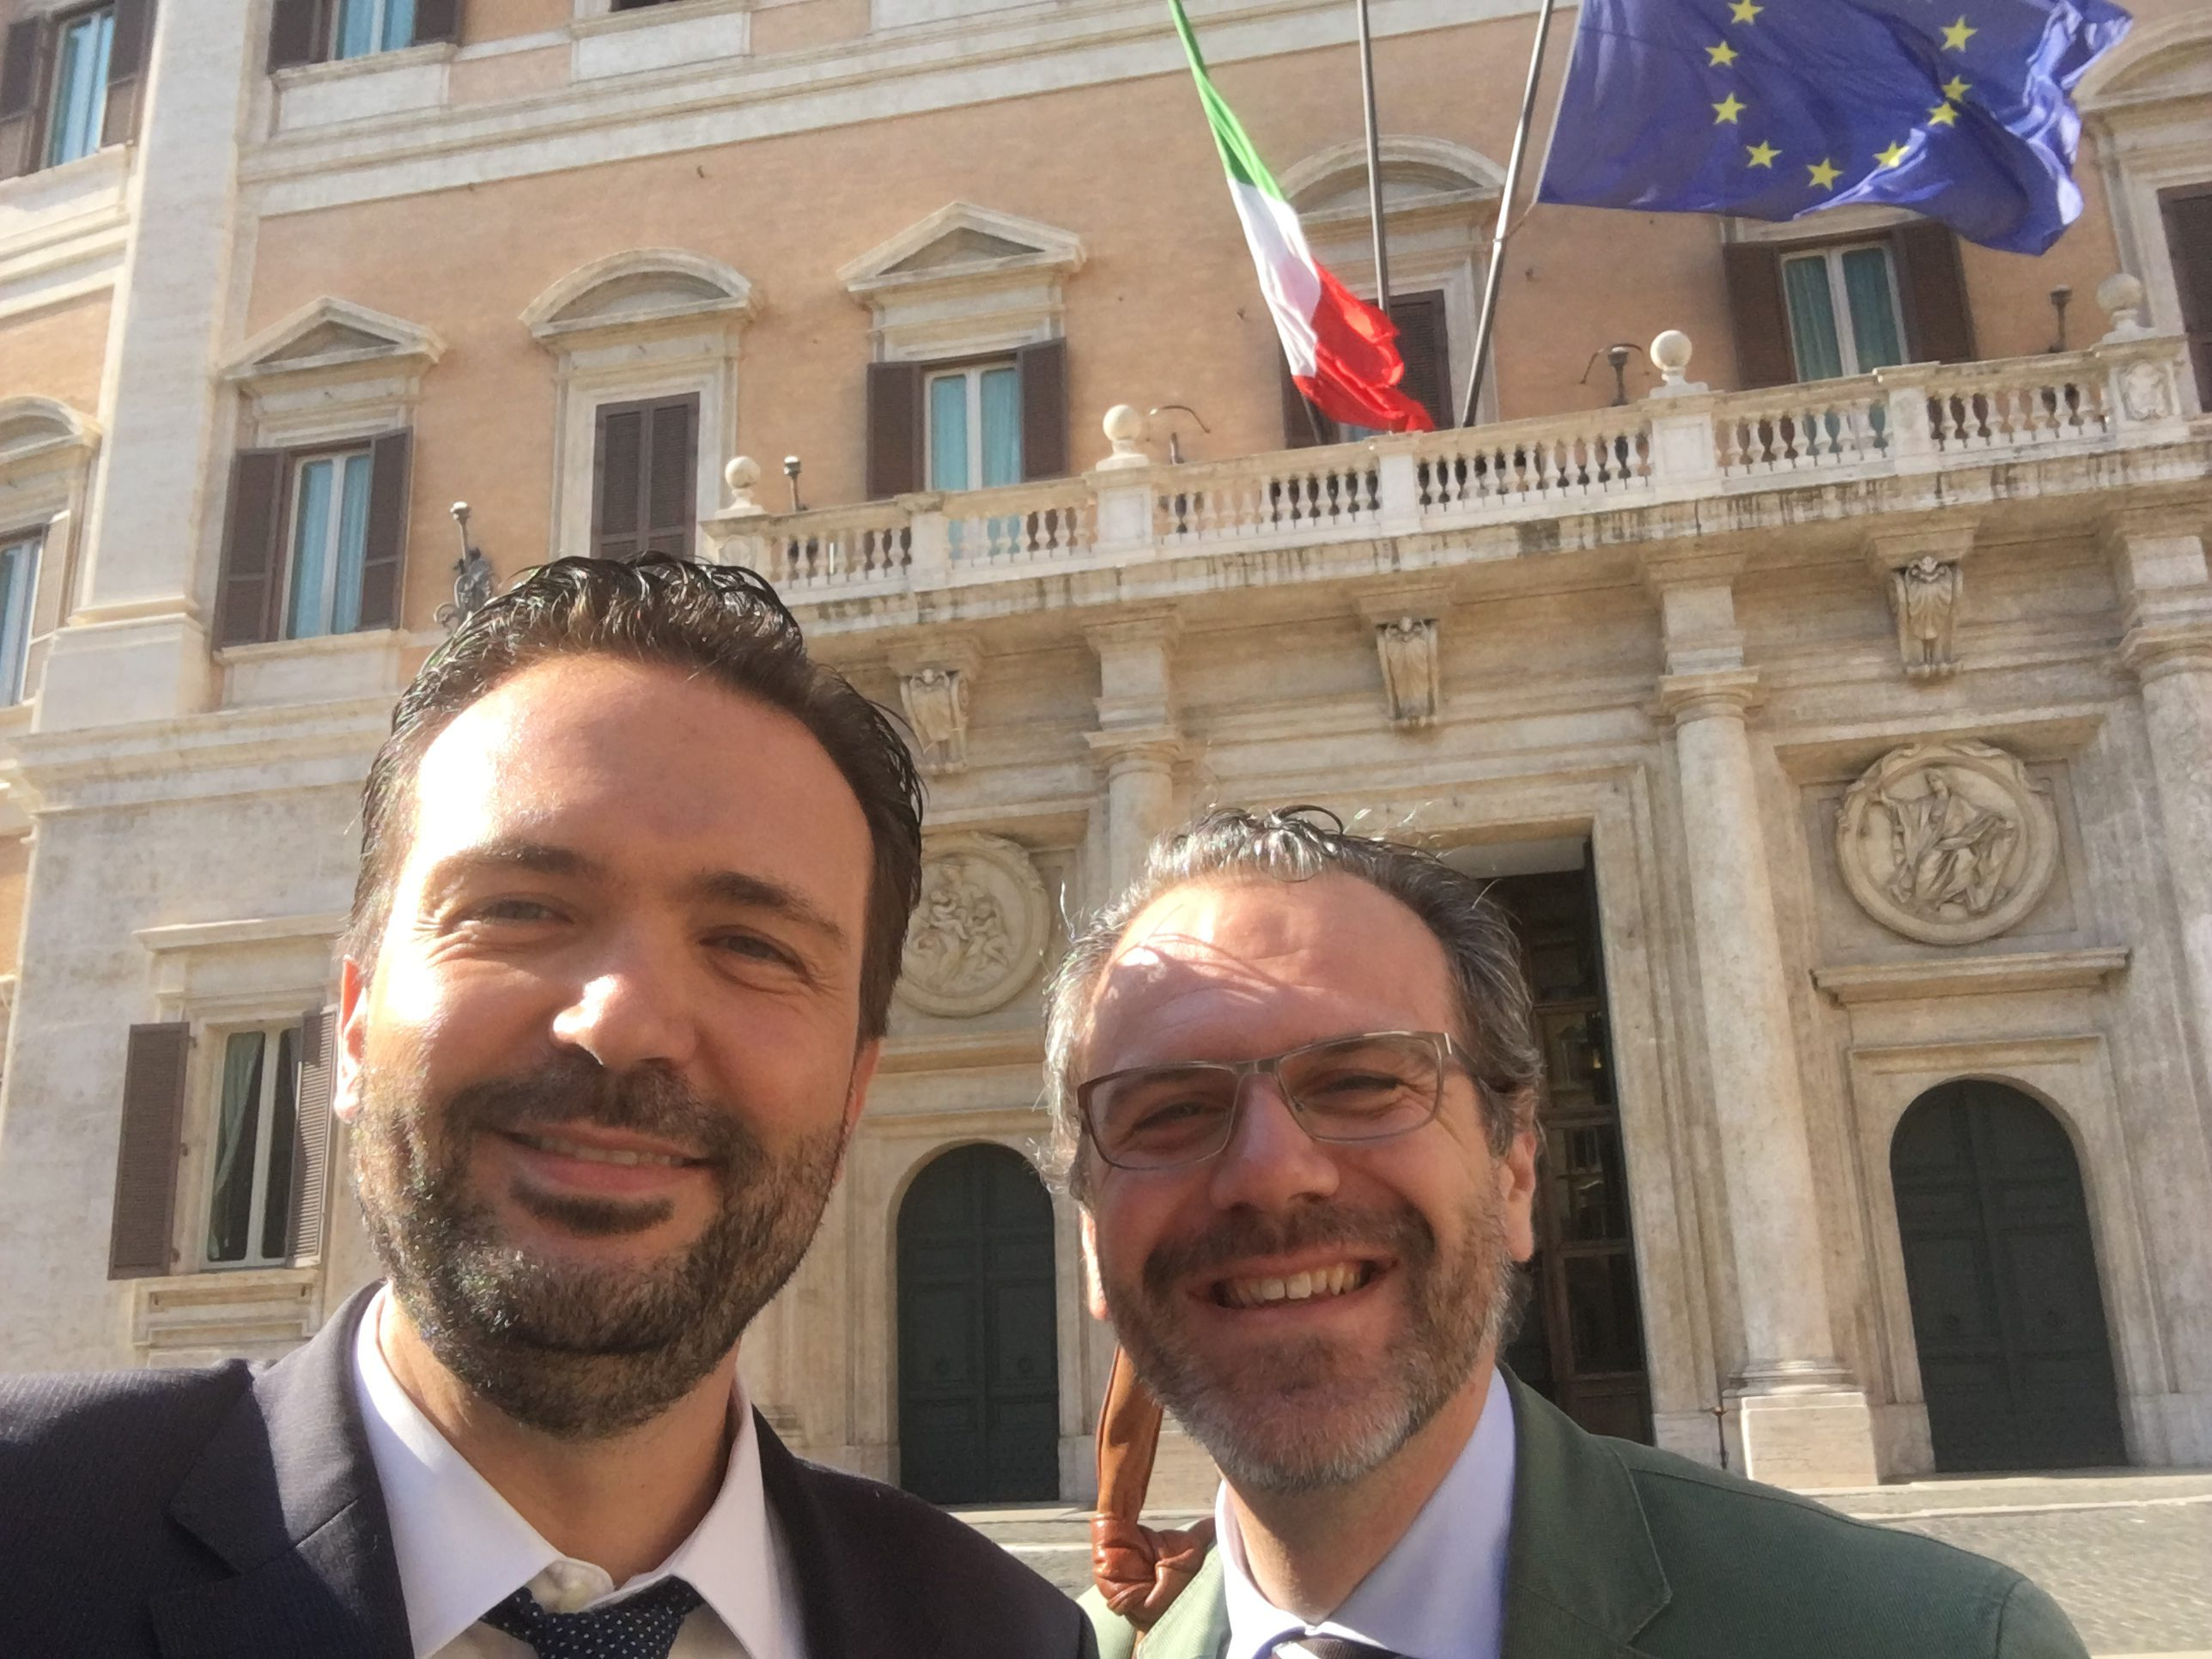 Incontro con Ernesto Pravisano - Presidente Comites Olanda - Roma